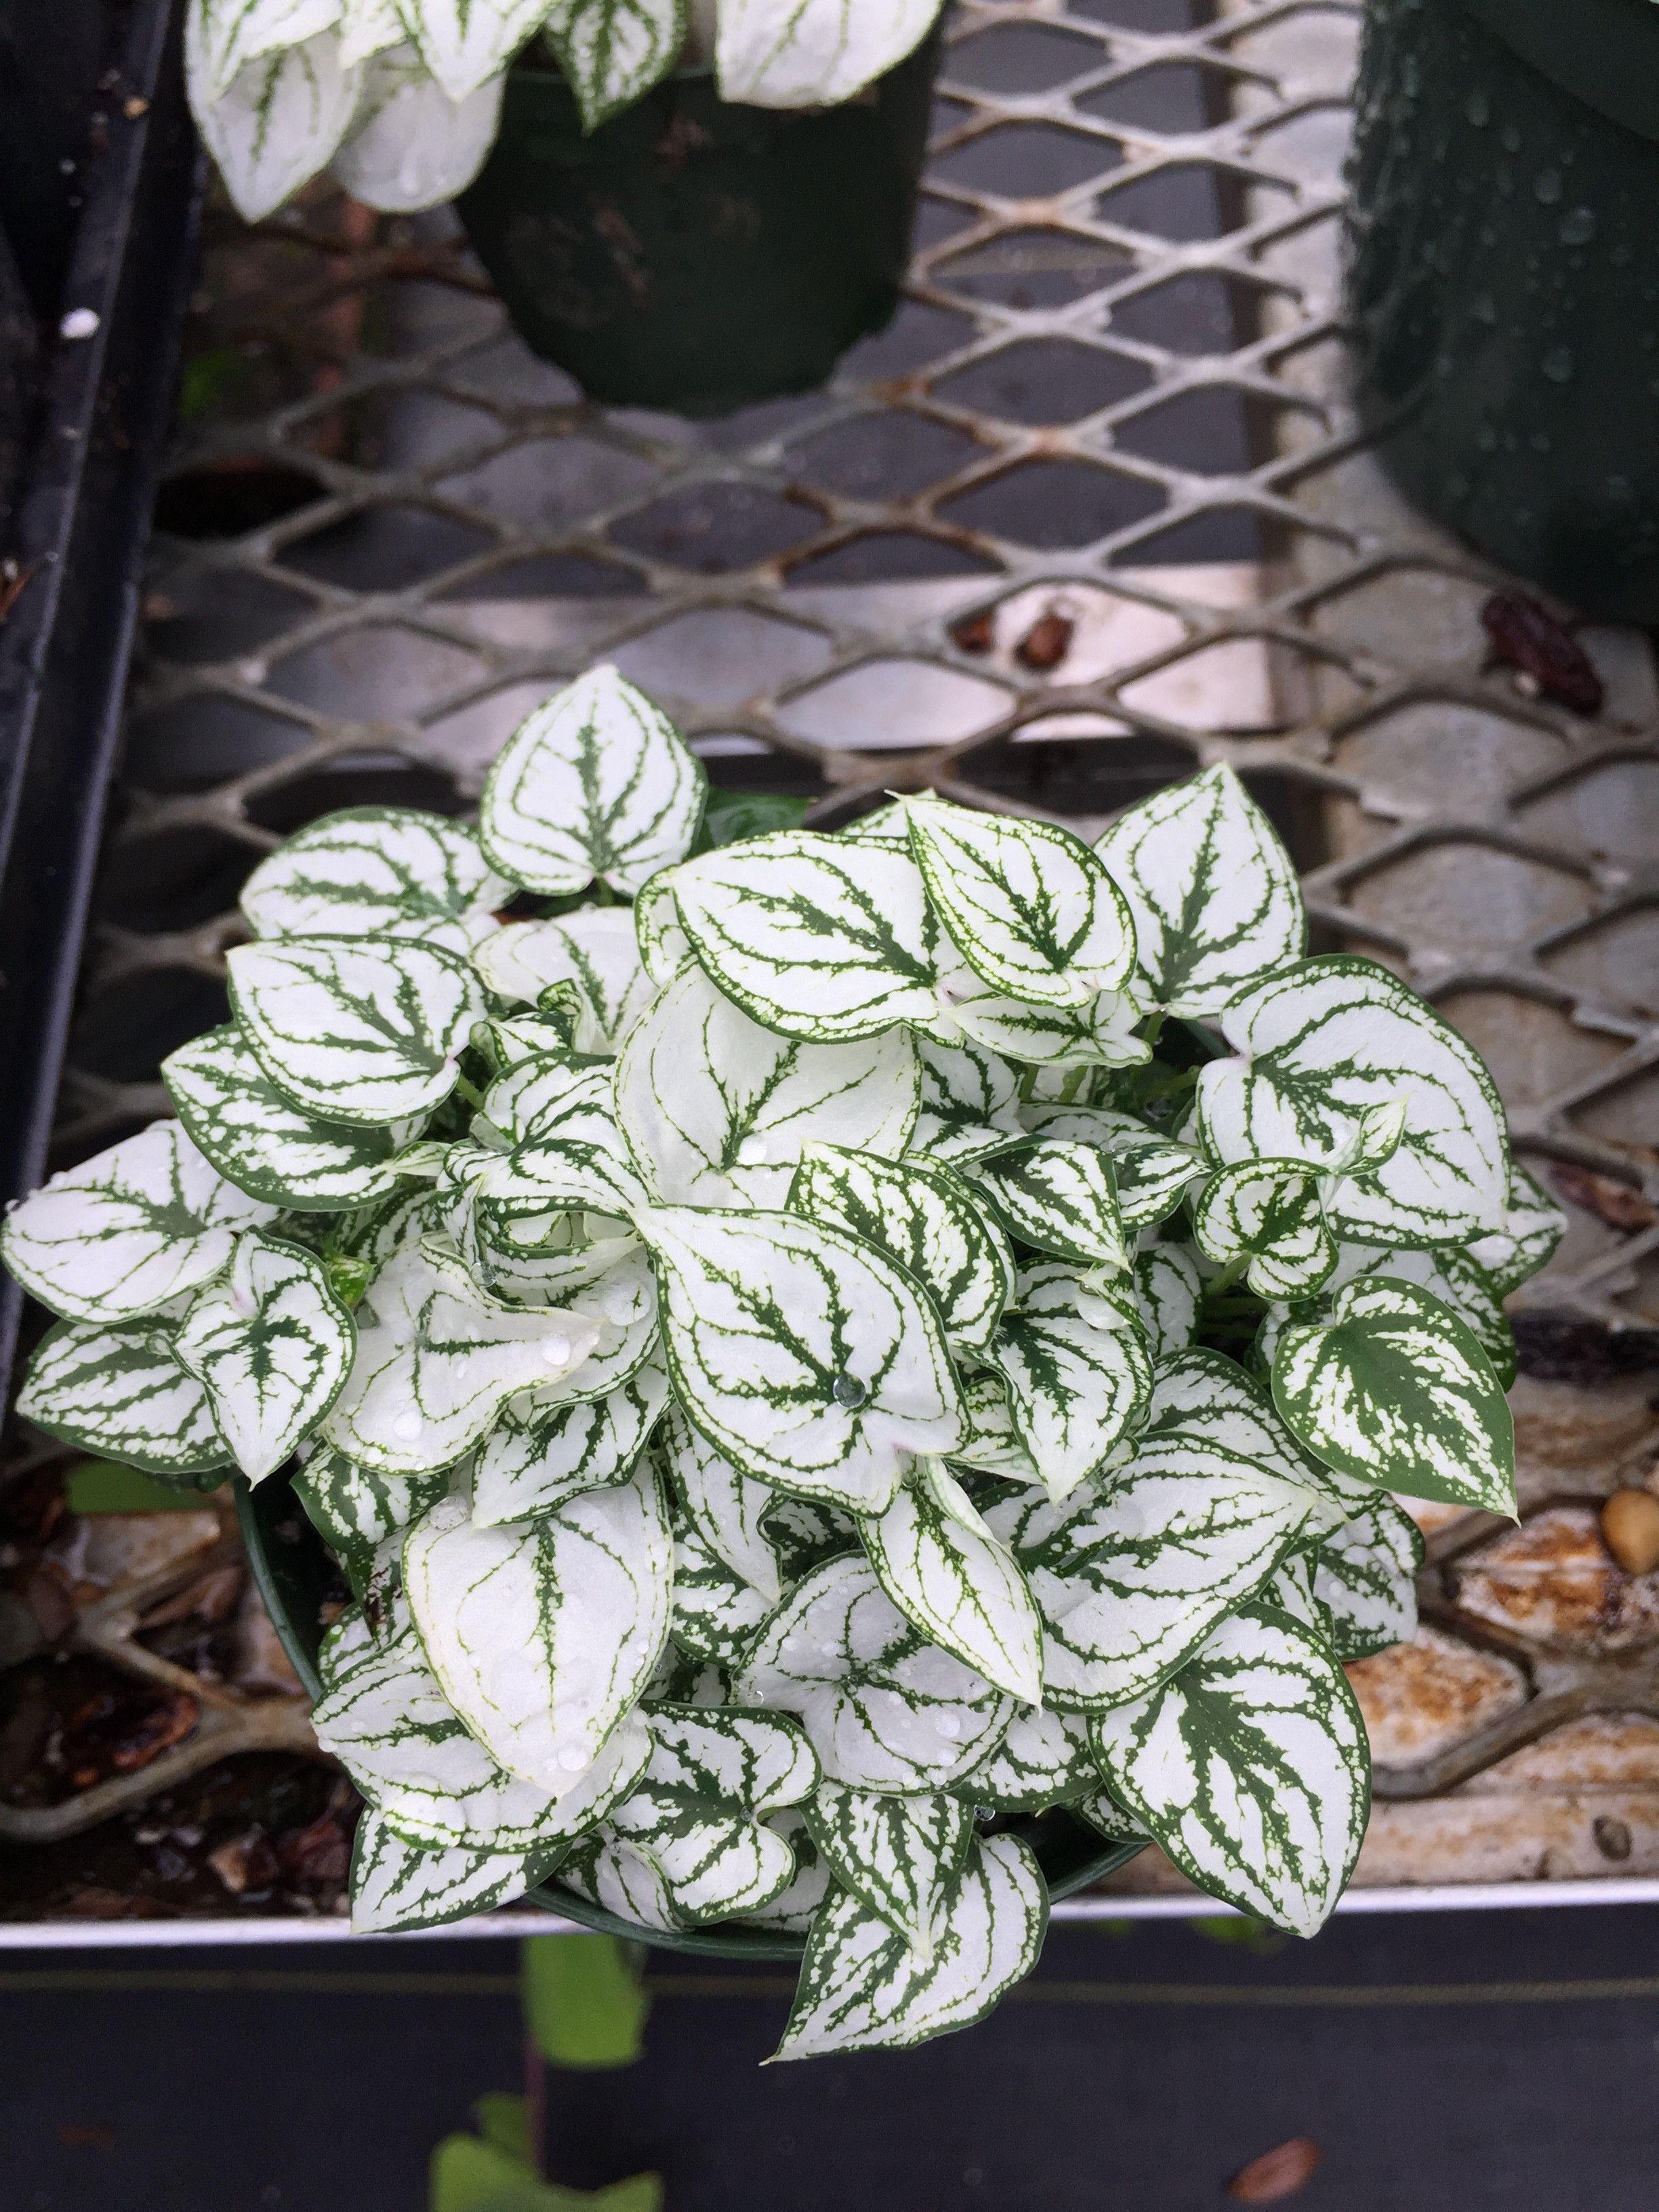 Caladium humboldtii dwarf white caladium Beautiful